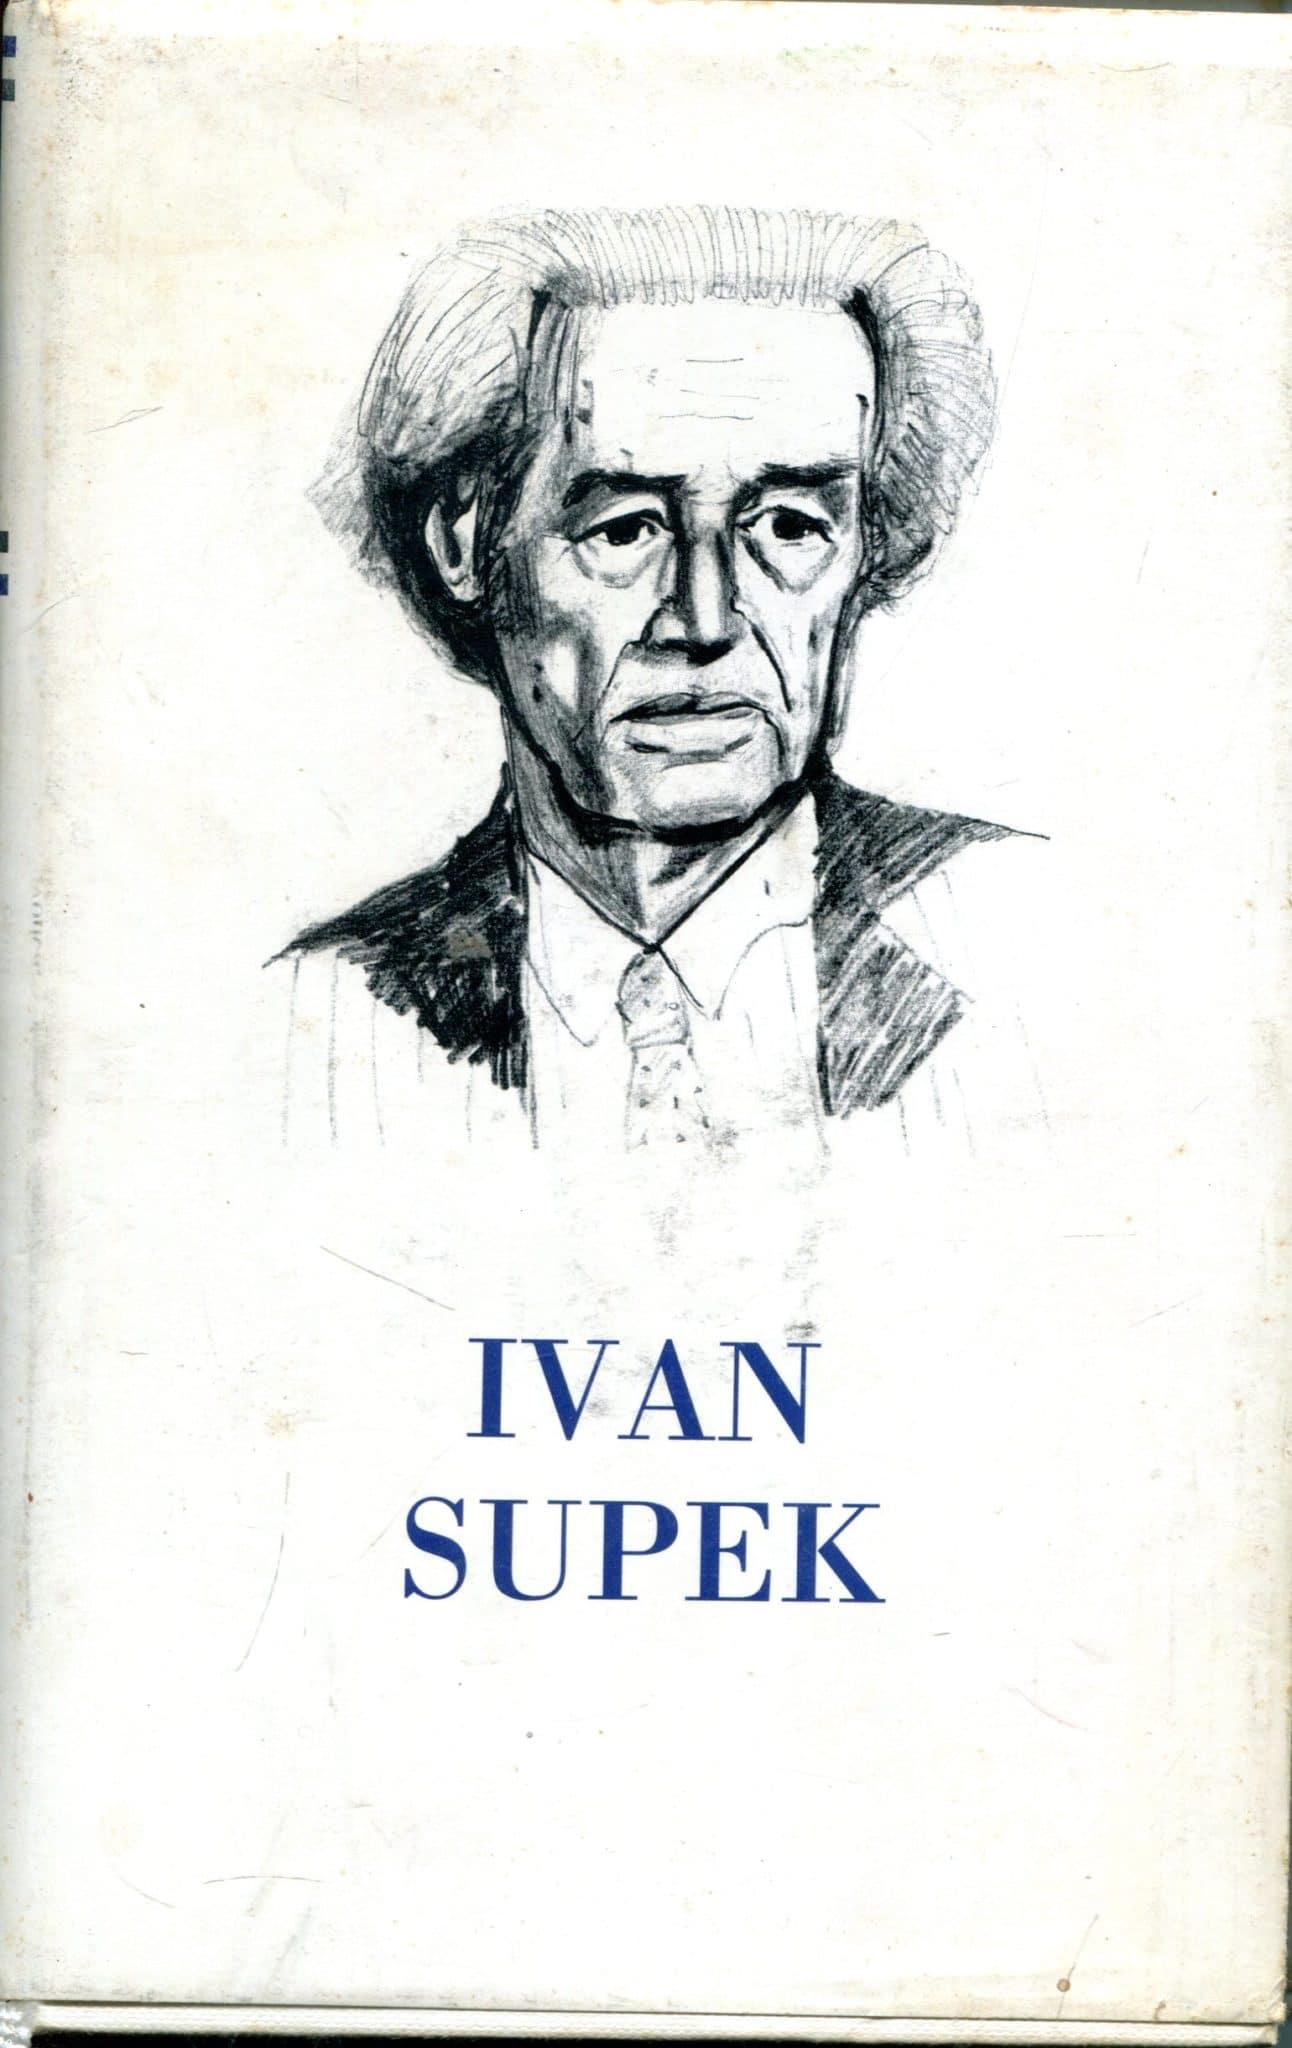 Izabrana djela 144. Ivan Supek